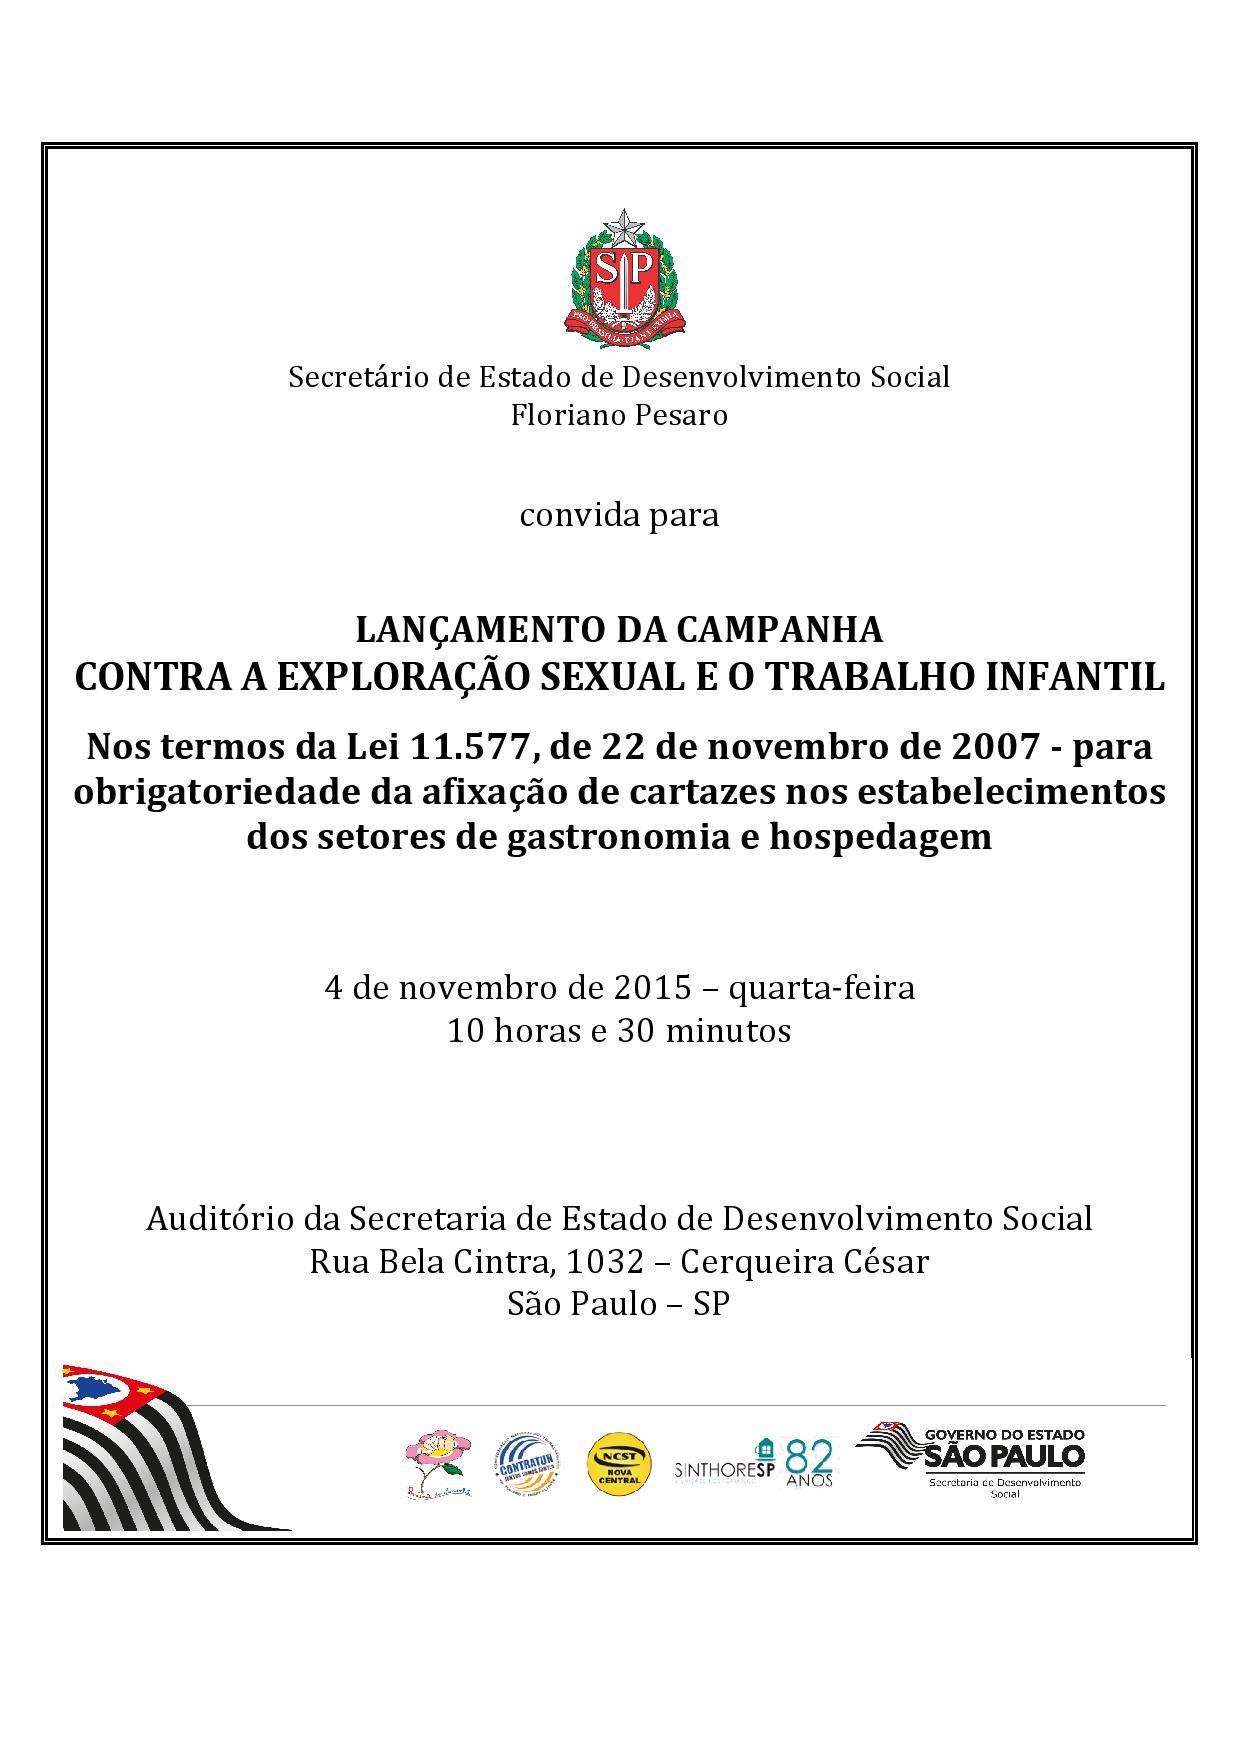 CONVITE_Lancamento Campanha SINTHORESP_C-page-001